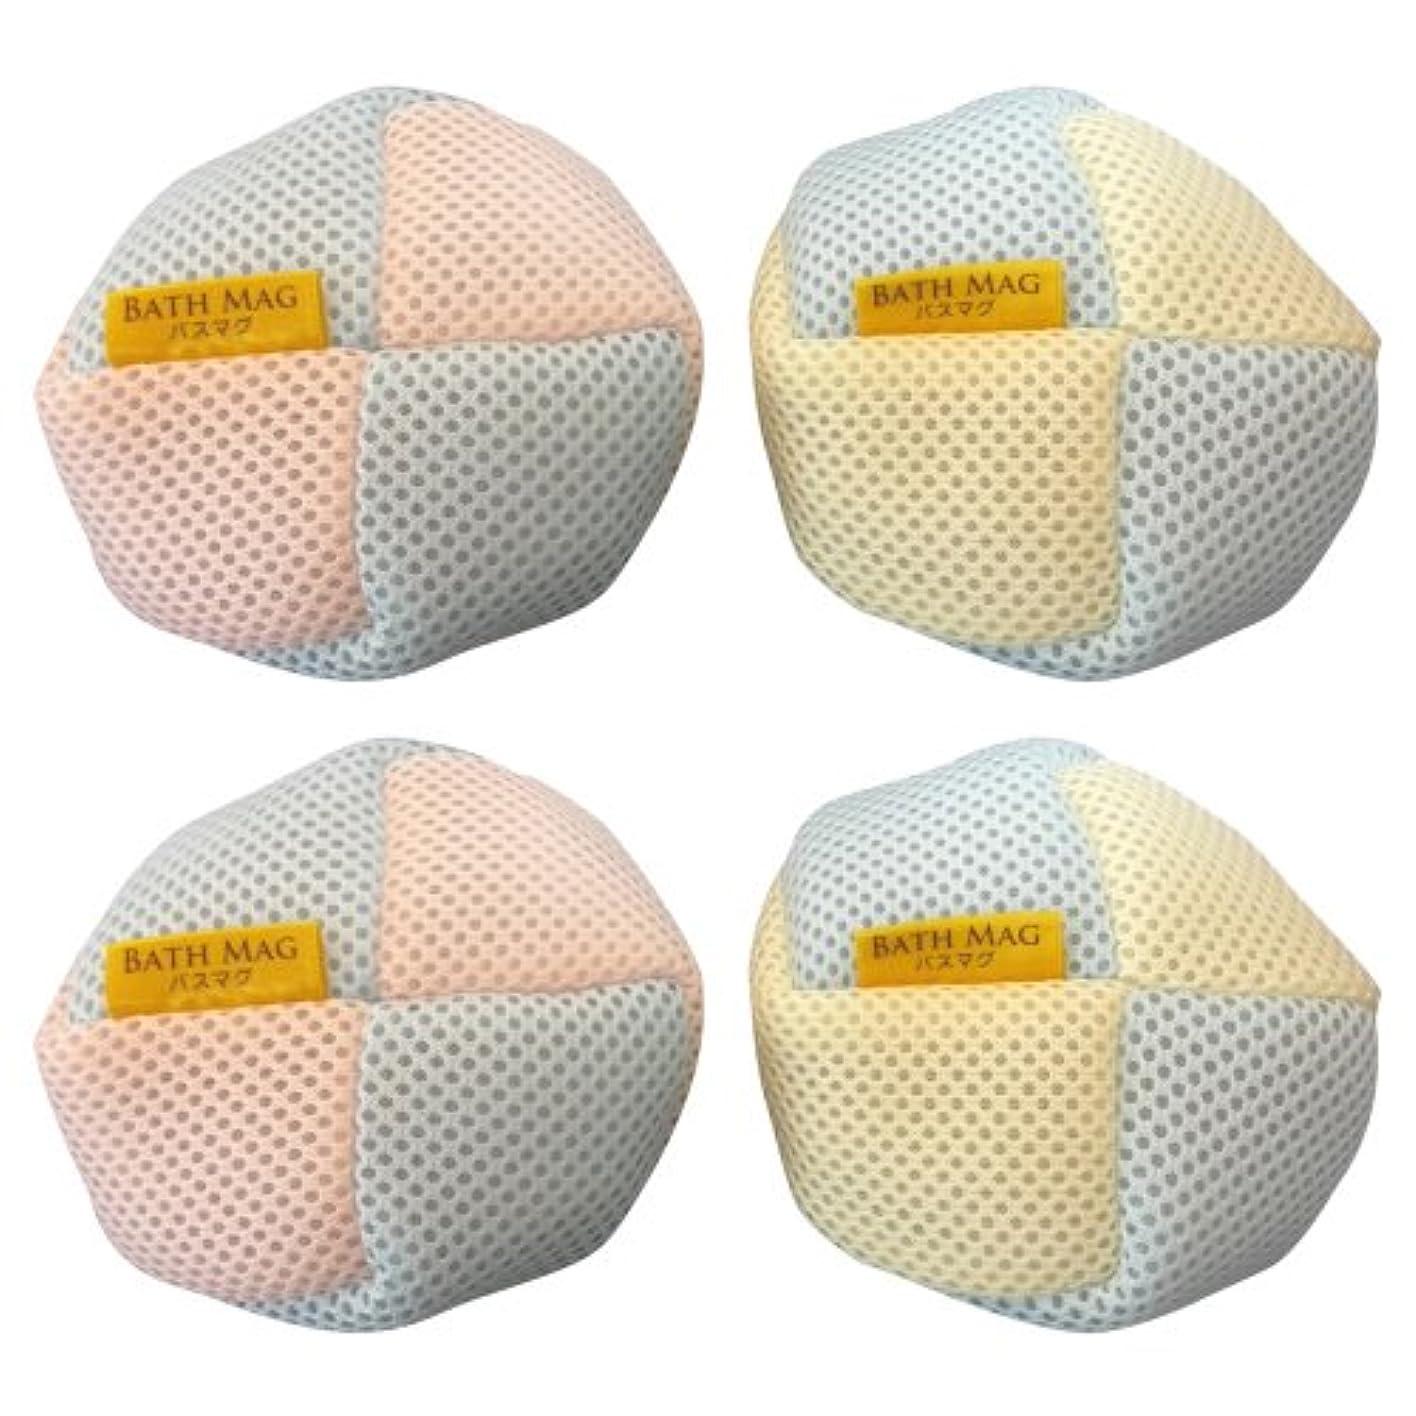 BATH MAG マグネシウムde水素浴(バスマグ)2個入り×2箱セット(計4個)